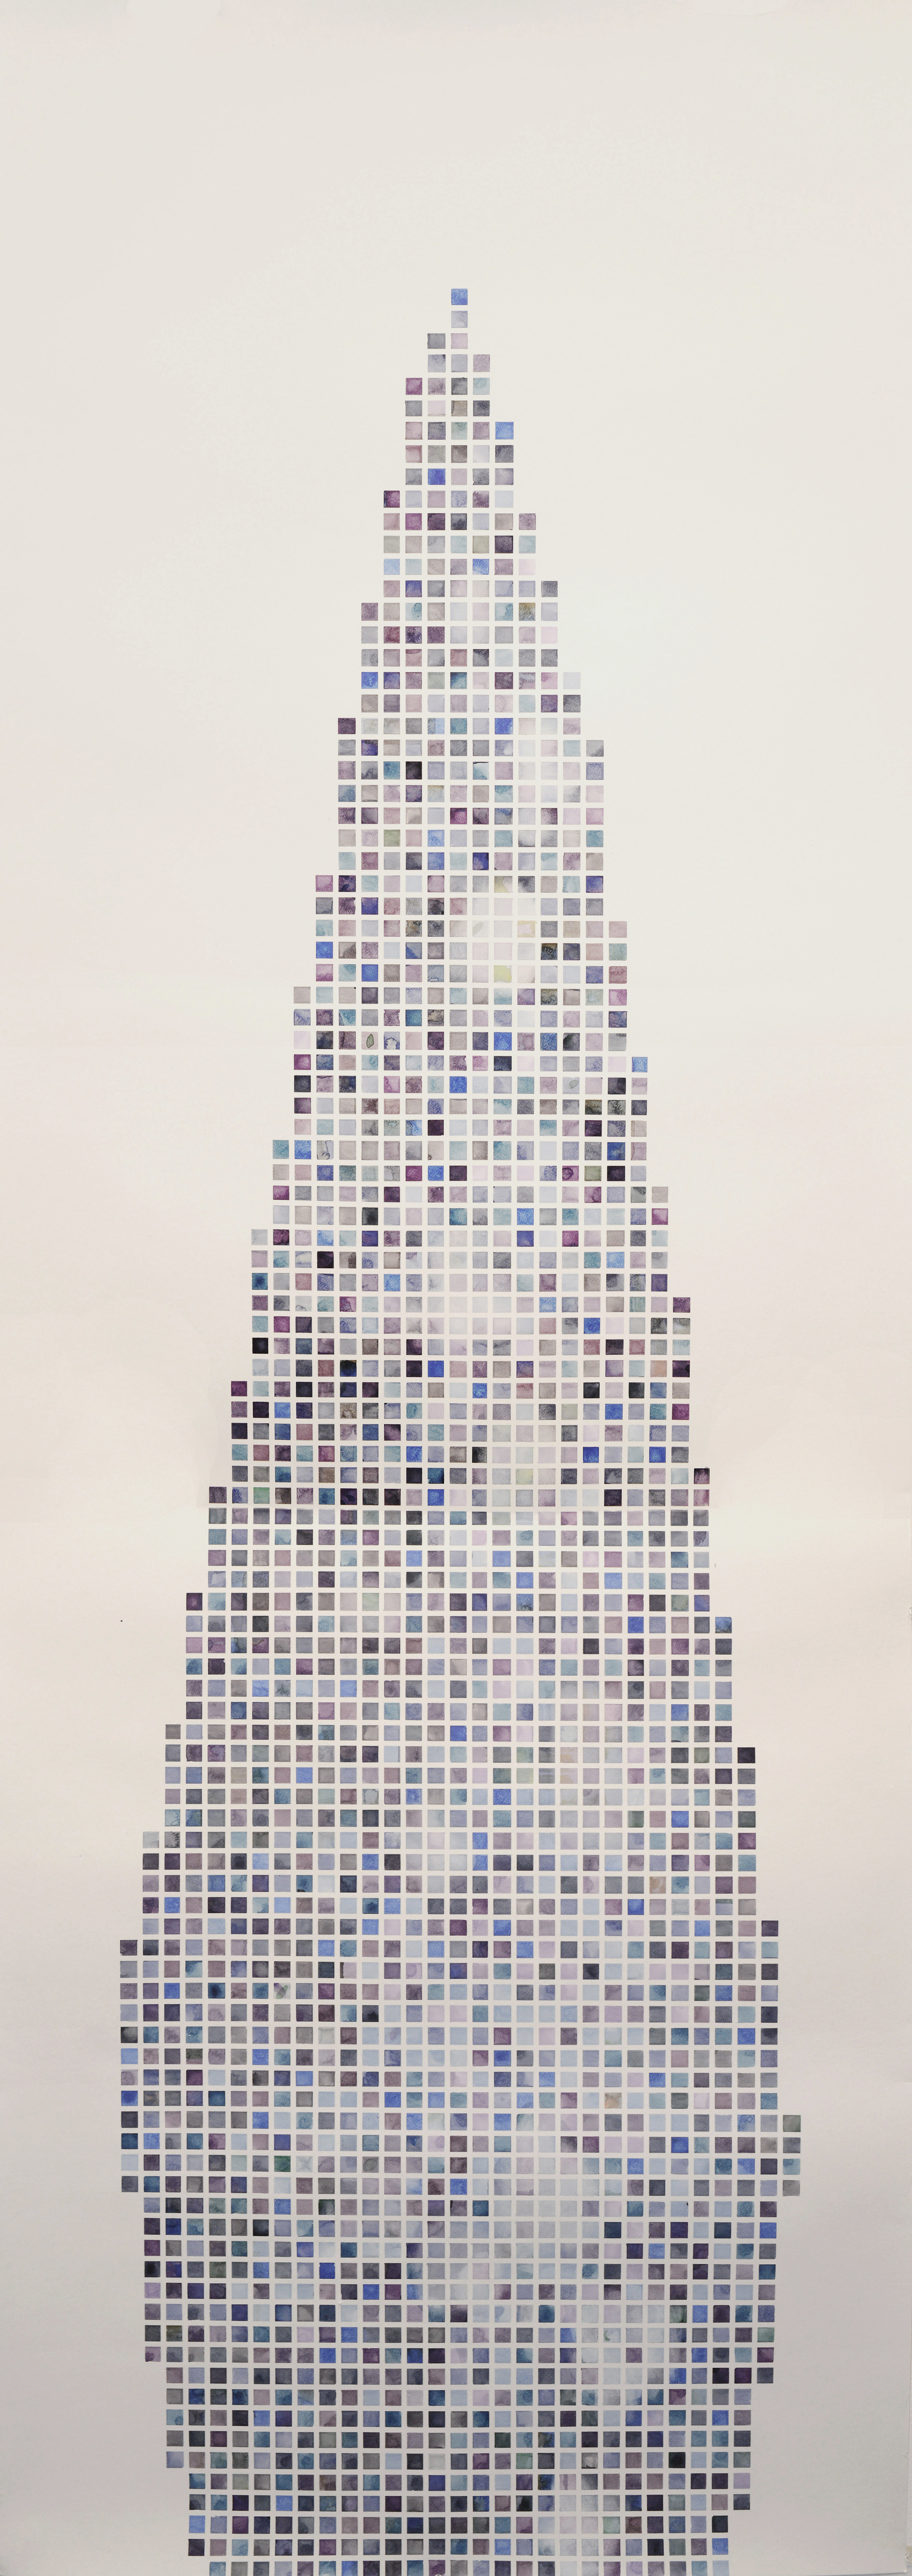 landscape of pixel no.6